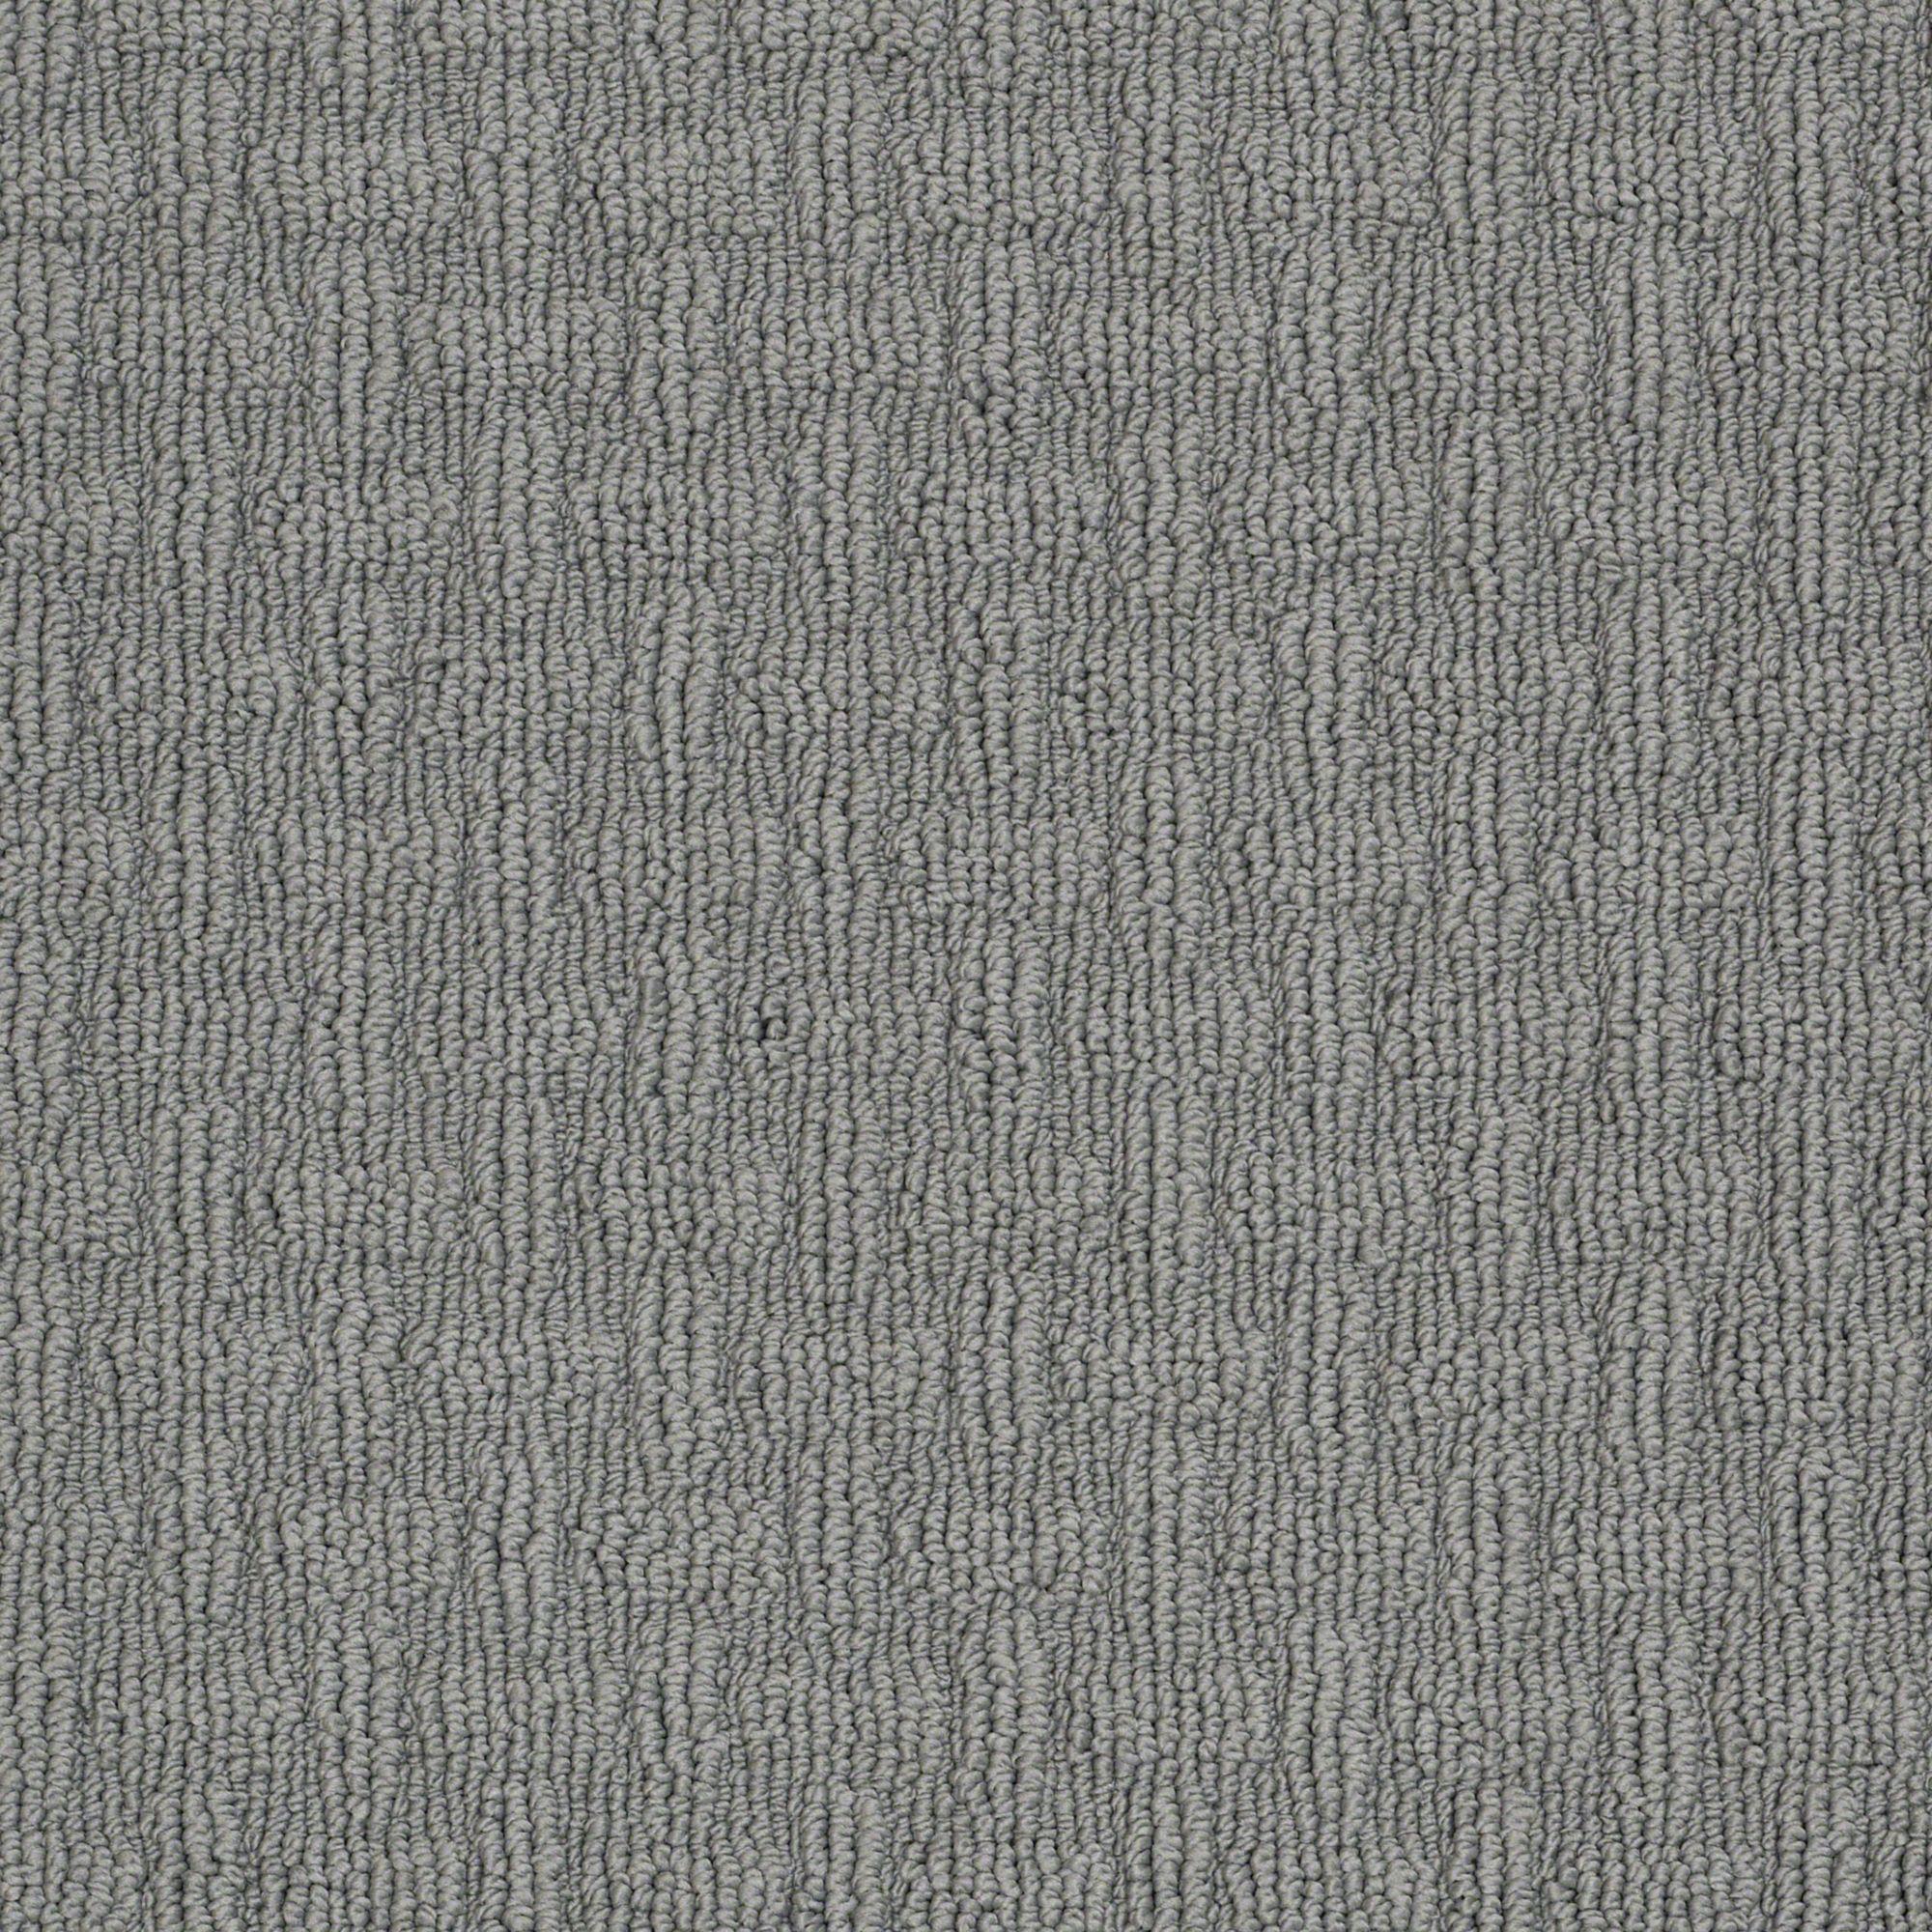 Caraban Carpet Samples Carpet Flooring Flooring